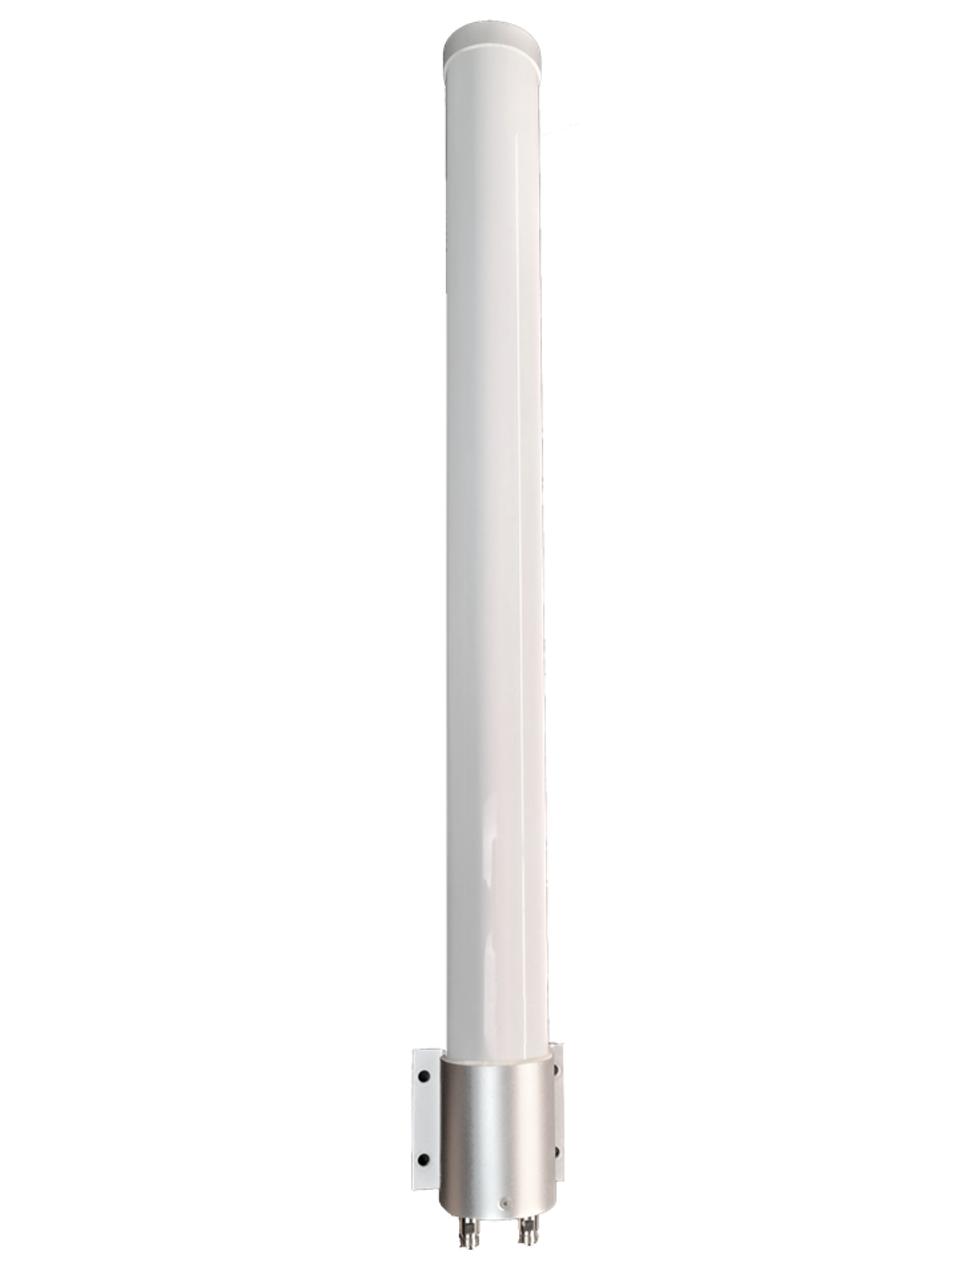 M39 Omni Directional MIMO 2 x Cellular 4G 5G LTE Antenna for Netgear Nighthawk 5G MR5100-Pro w/Bracket Mount - 2 x N Female w/Cable Length Options.